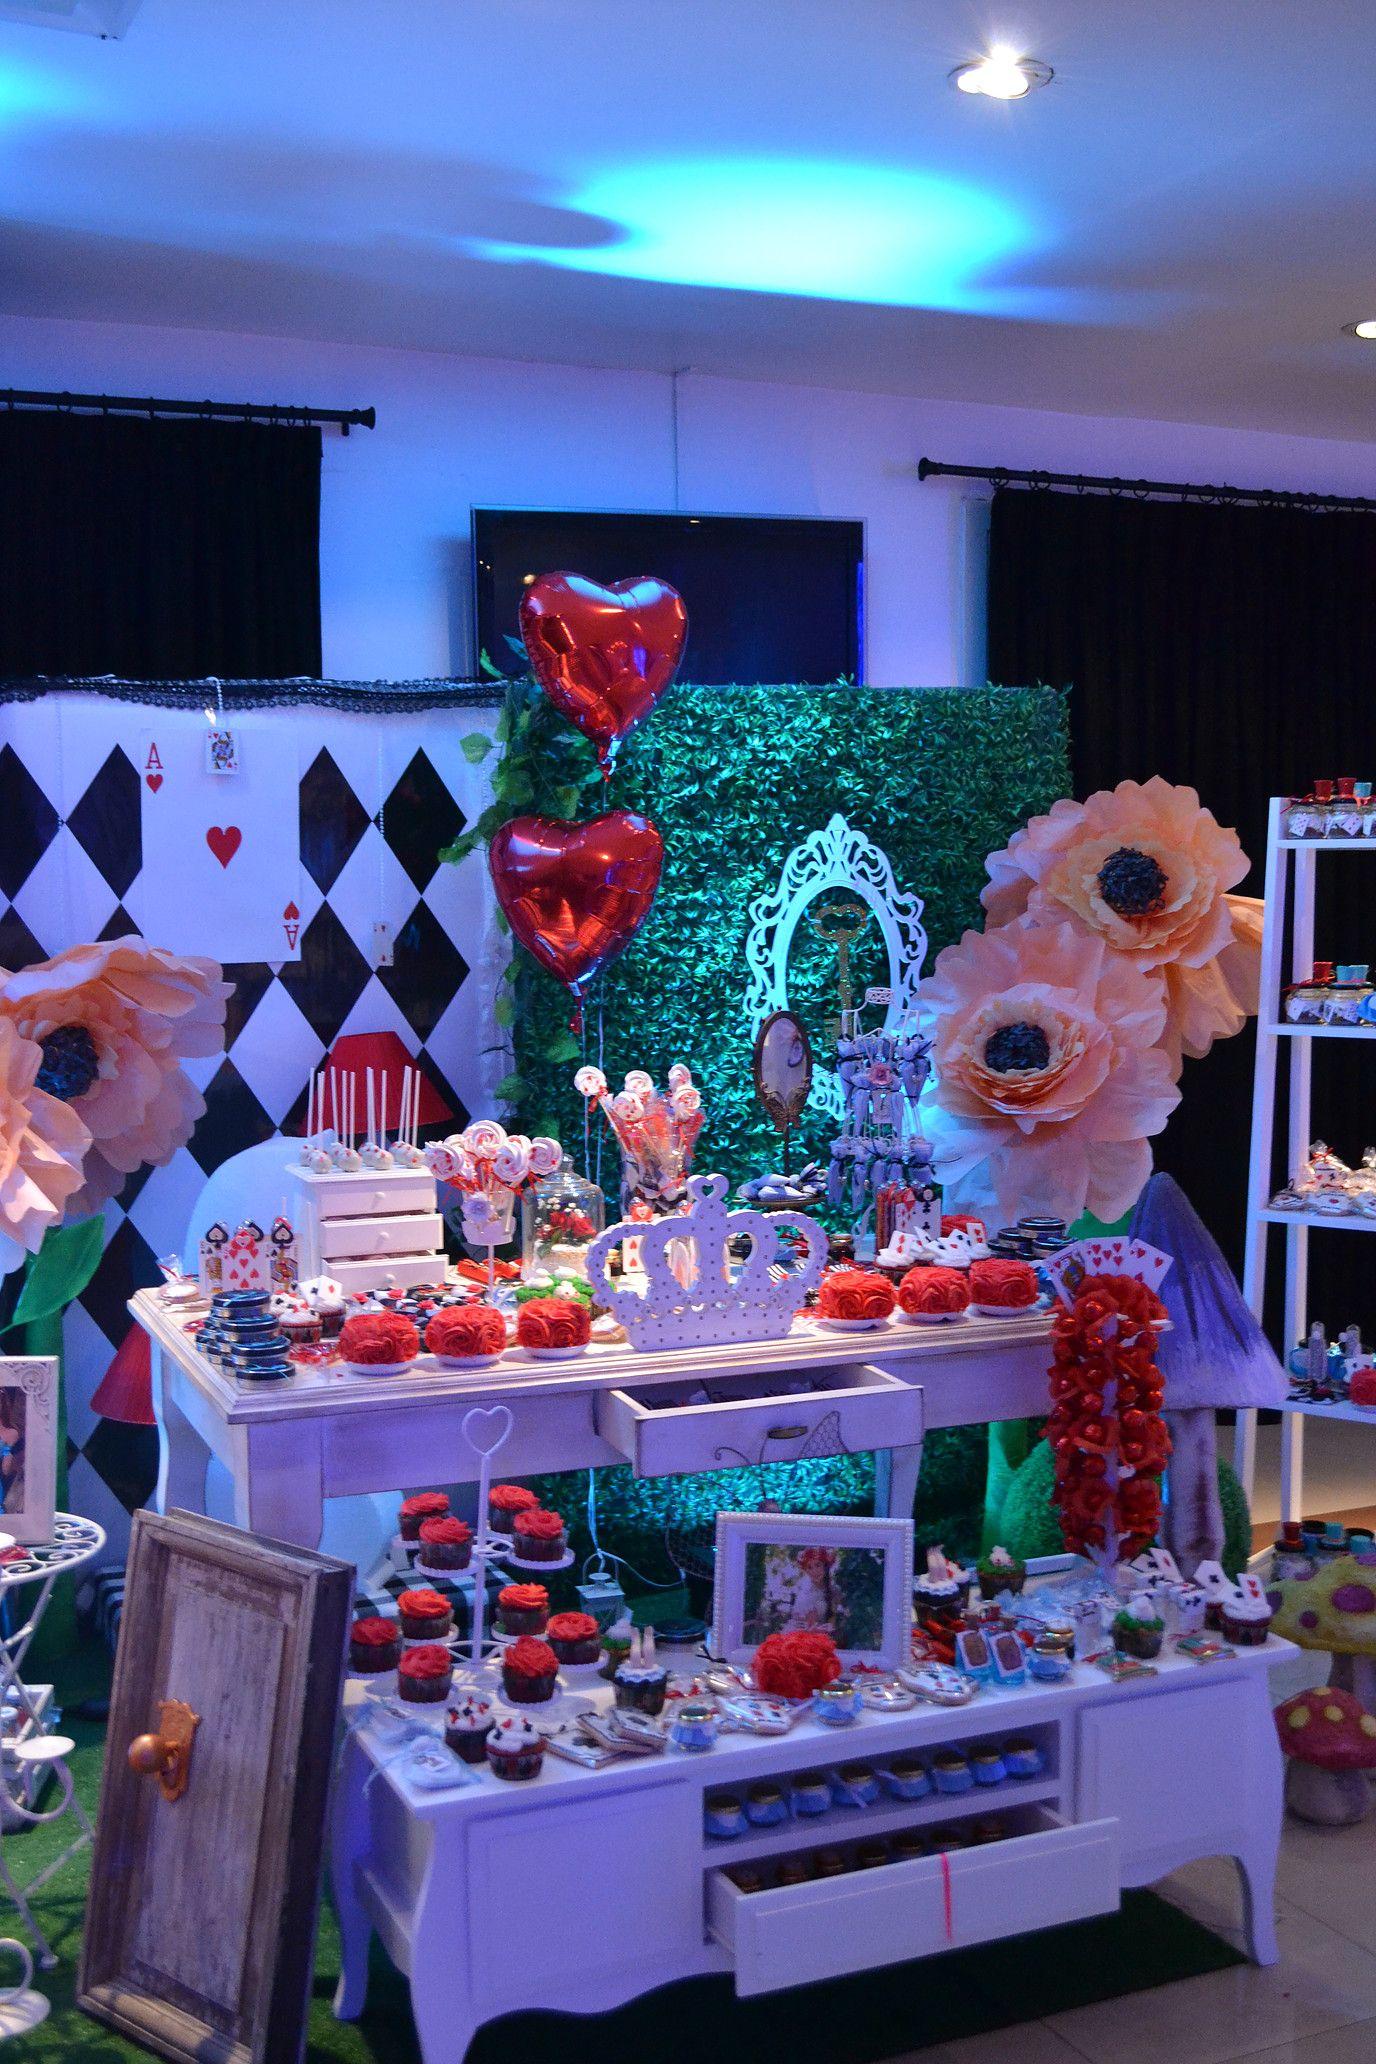 Nos especializamos en producci n y organizaci n de eventos for Decoracion xv anos alicia pais maravillas